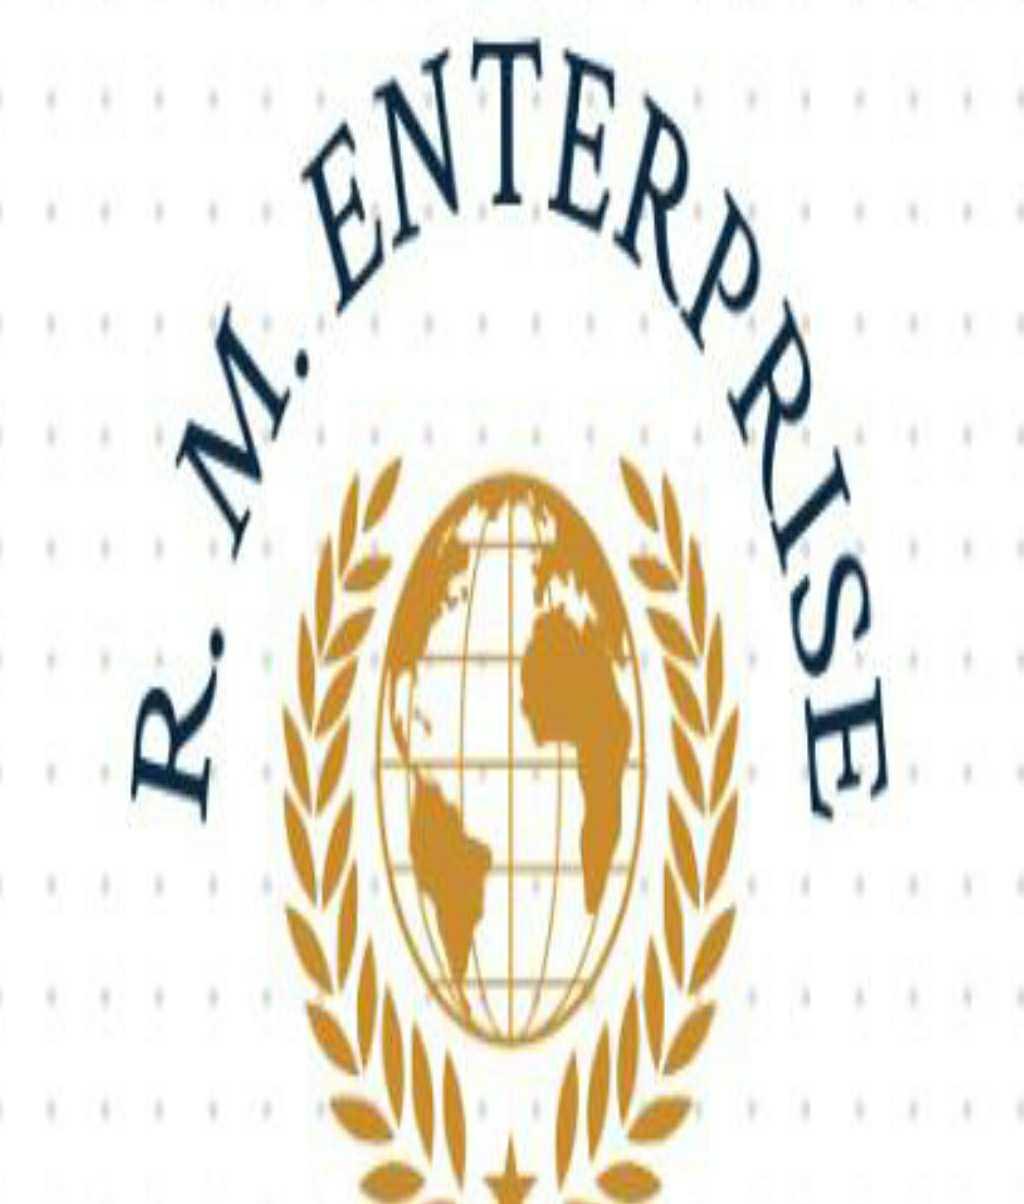 R. M. ENTERPRISE